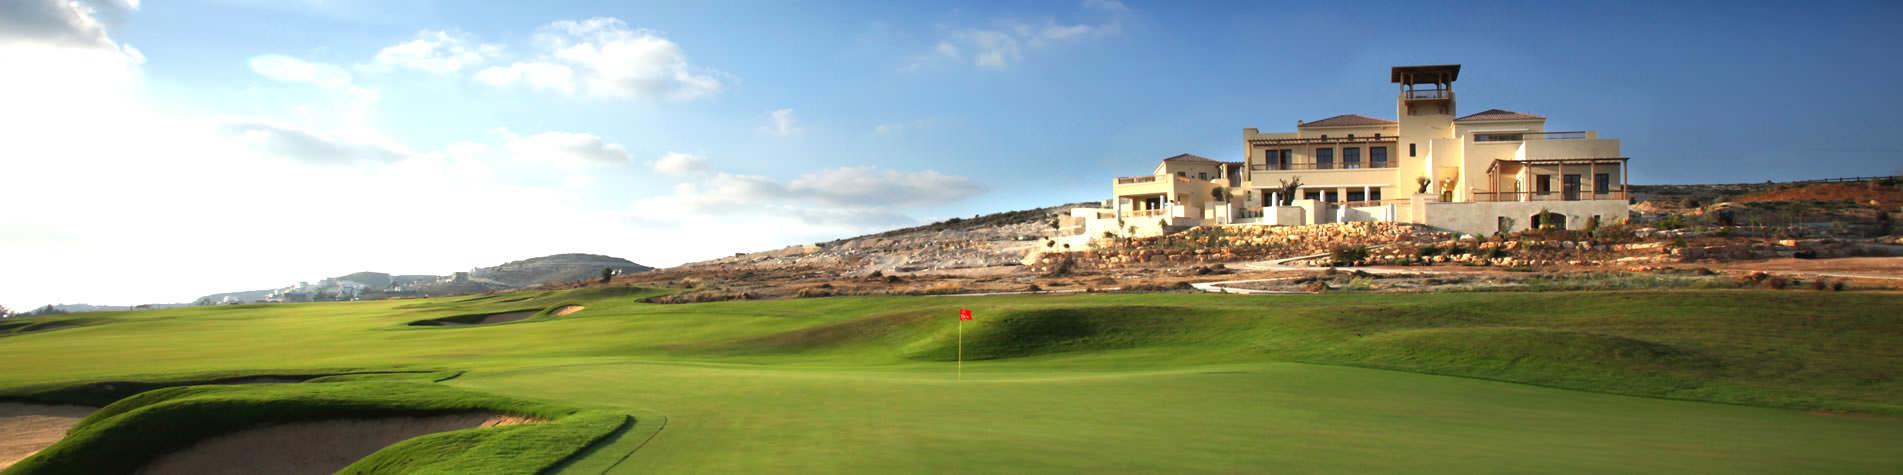 Golf Holidays with Cyplon Holidays